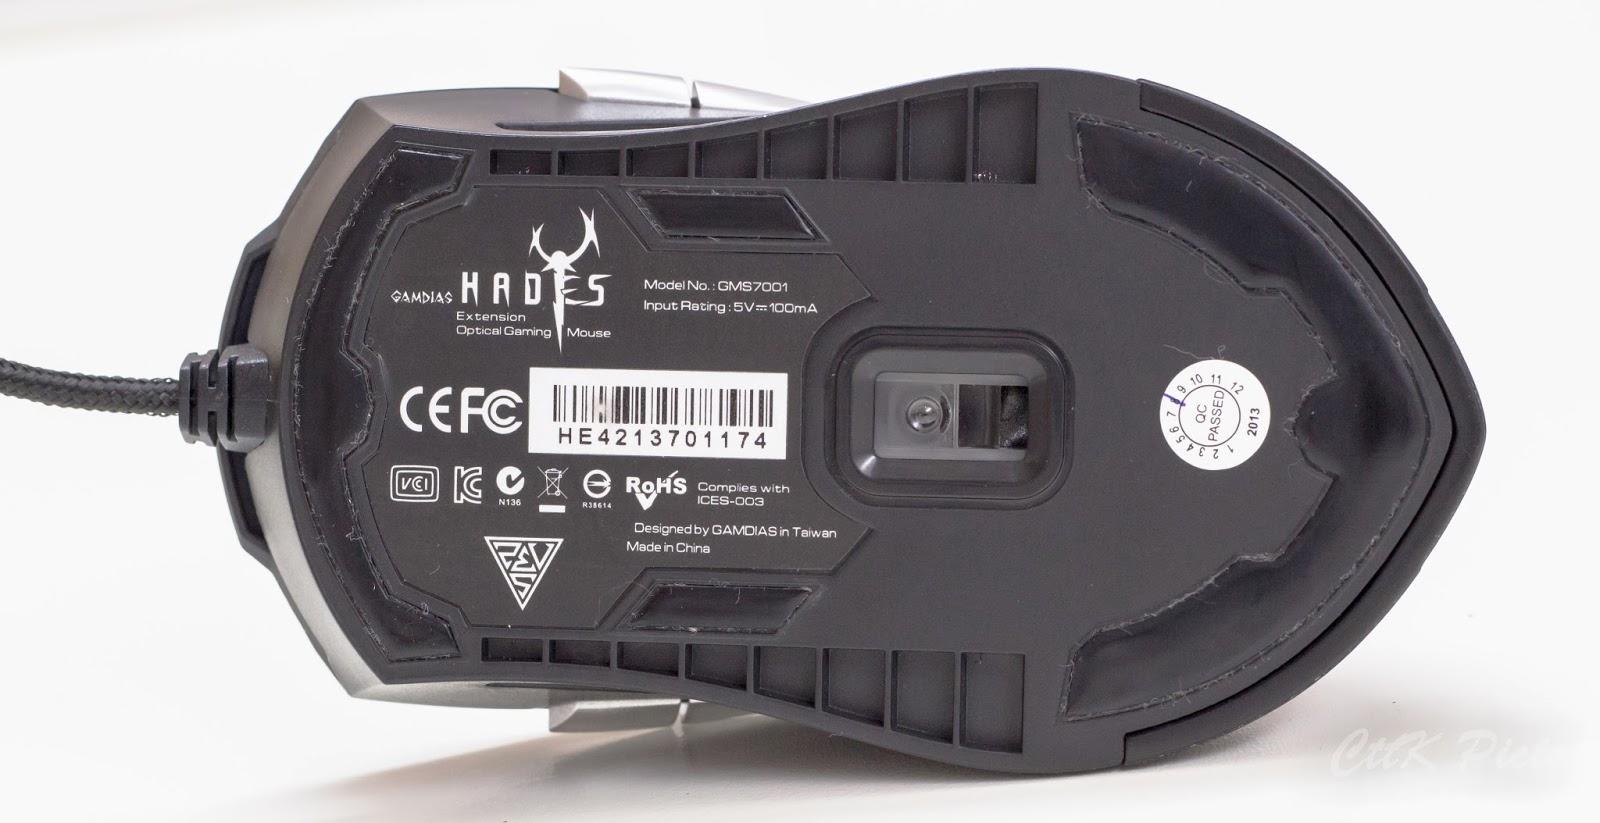 Gamdias Hades Extension Optical Gaming Mouse 67